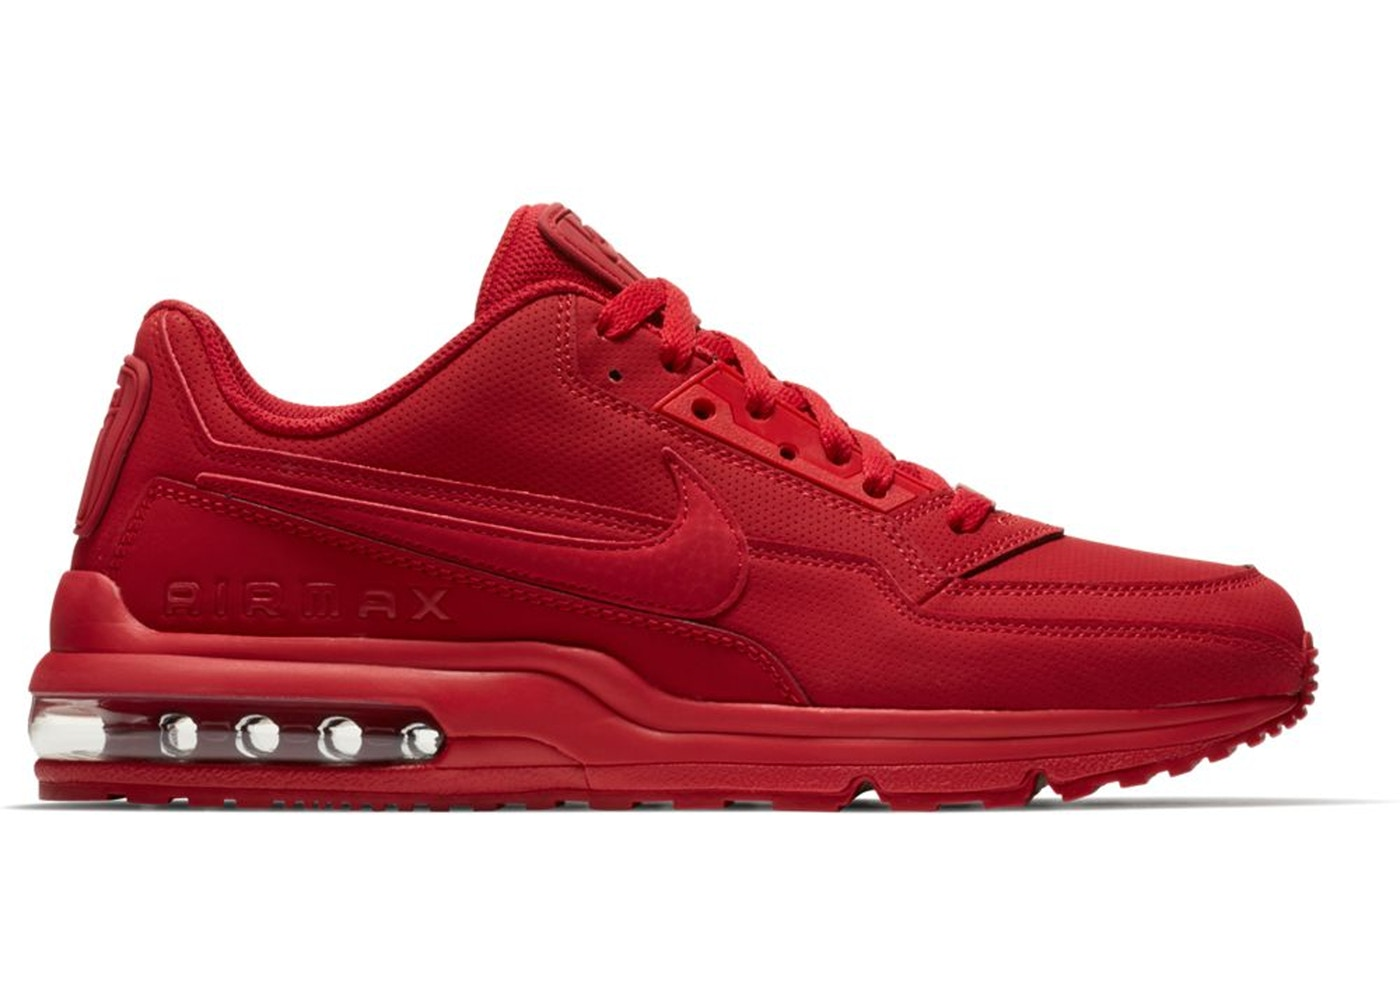 Nike Air Max LTD 3 Gym Red - 687977-602